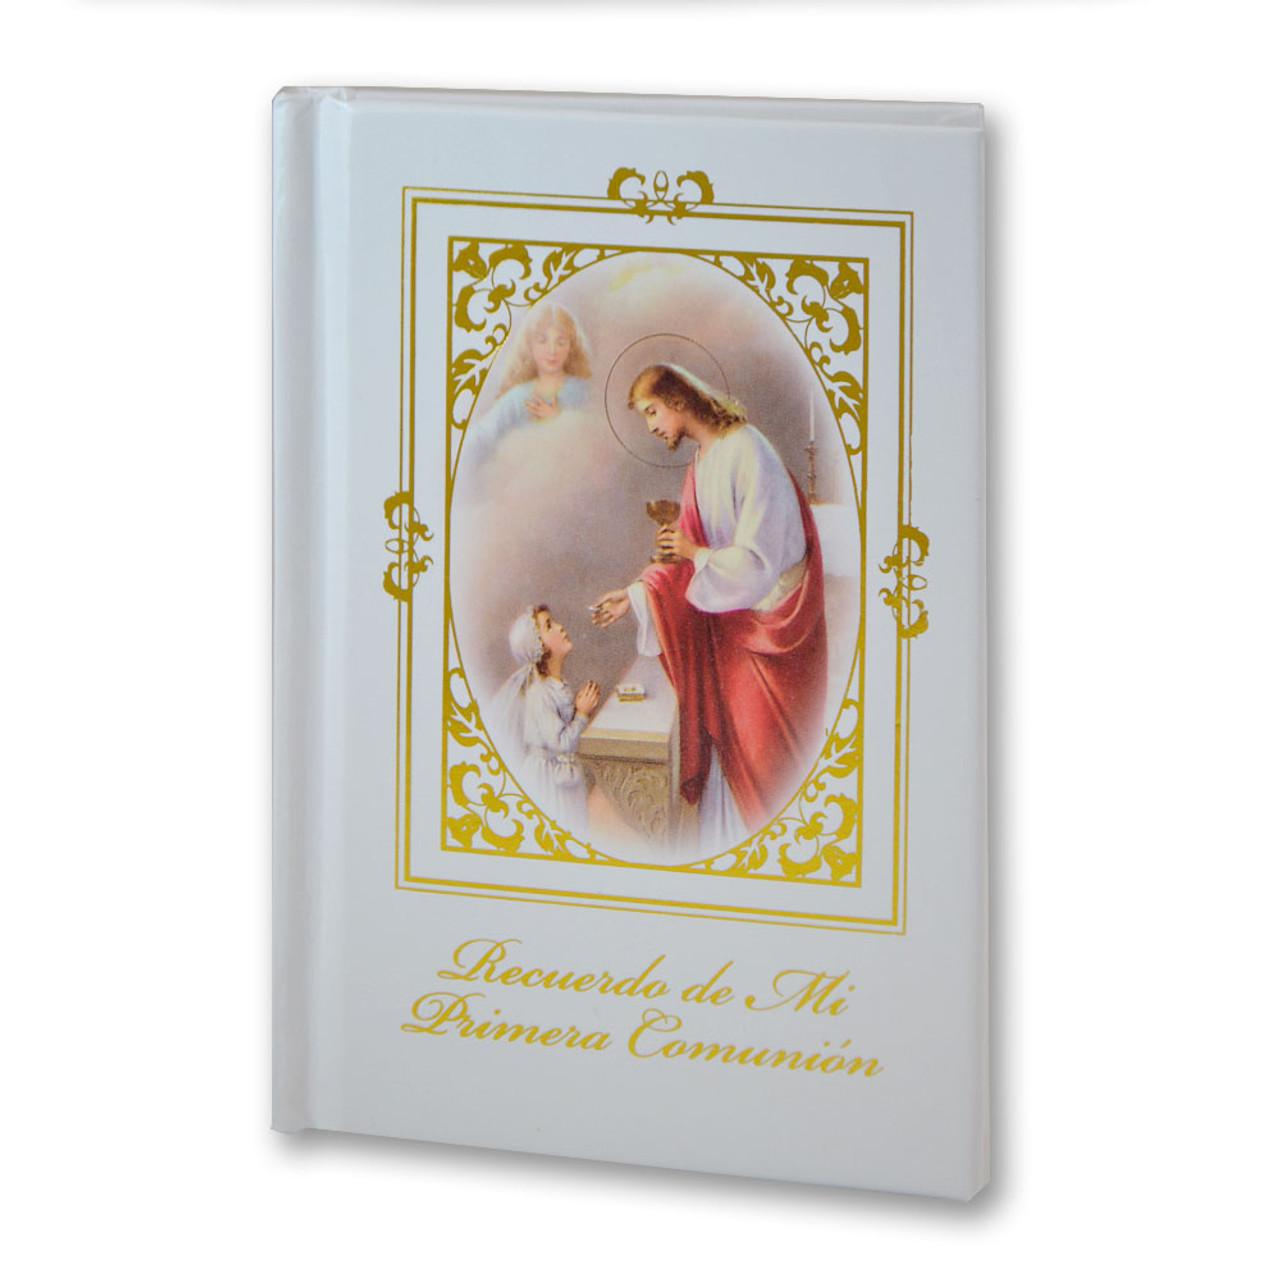 Girl's Spanish Hardcover First Communion Missal